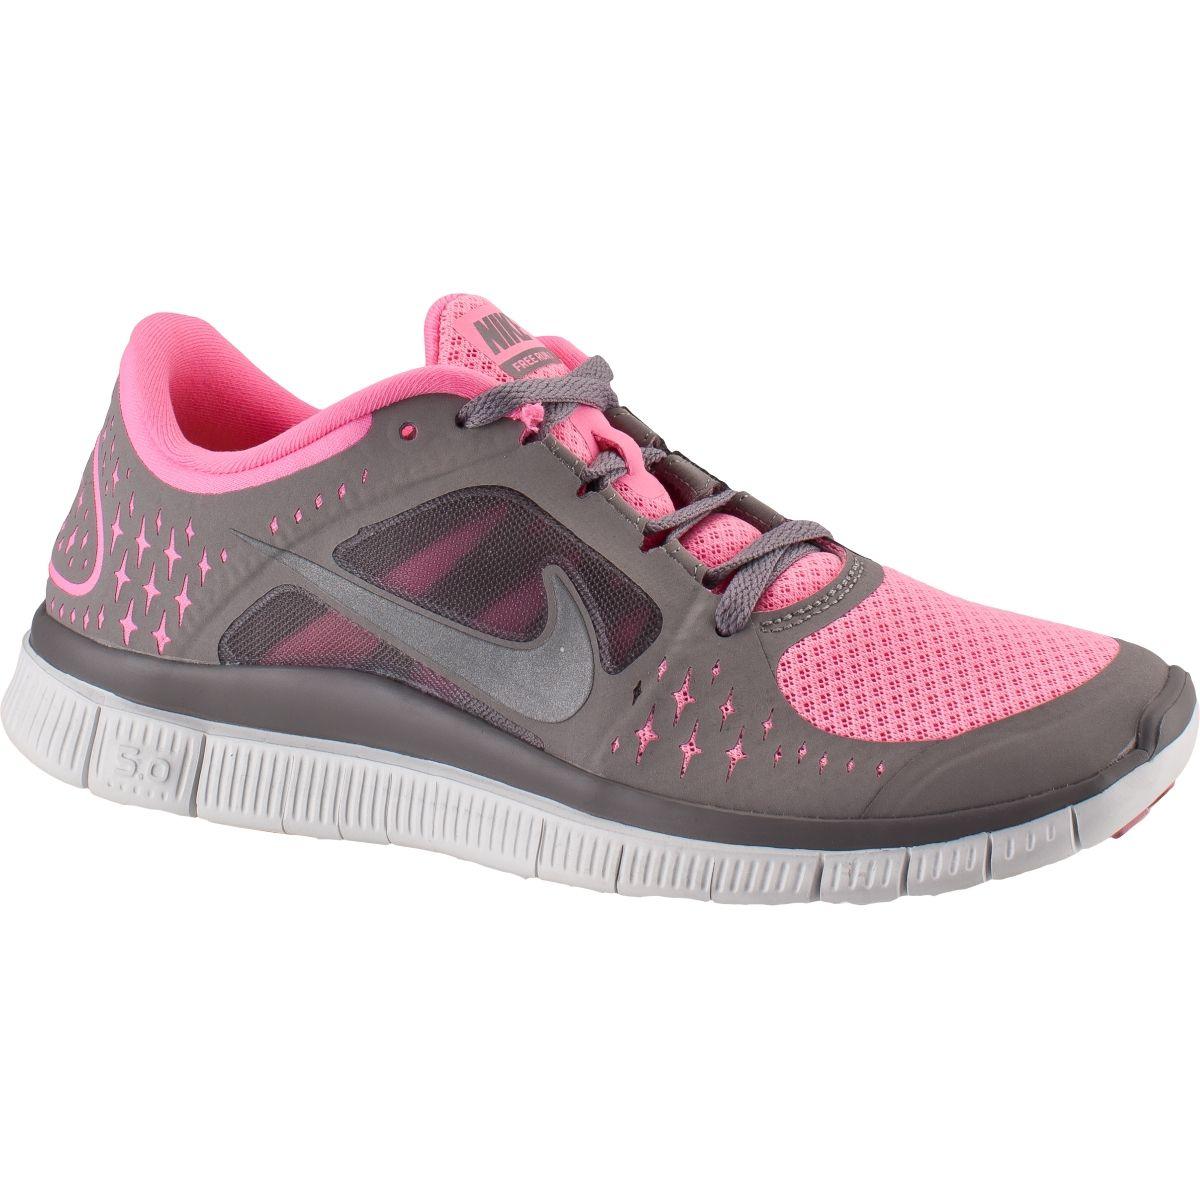 Nike Free Run + 3 Running Shoes Womens